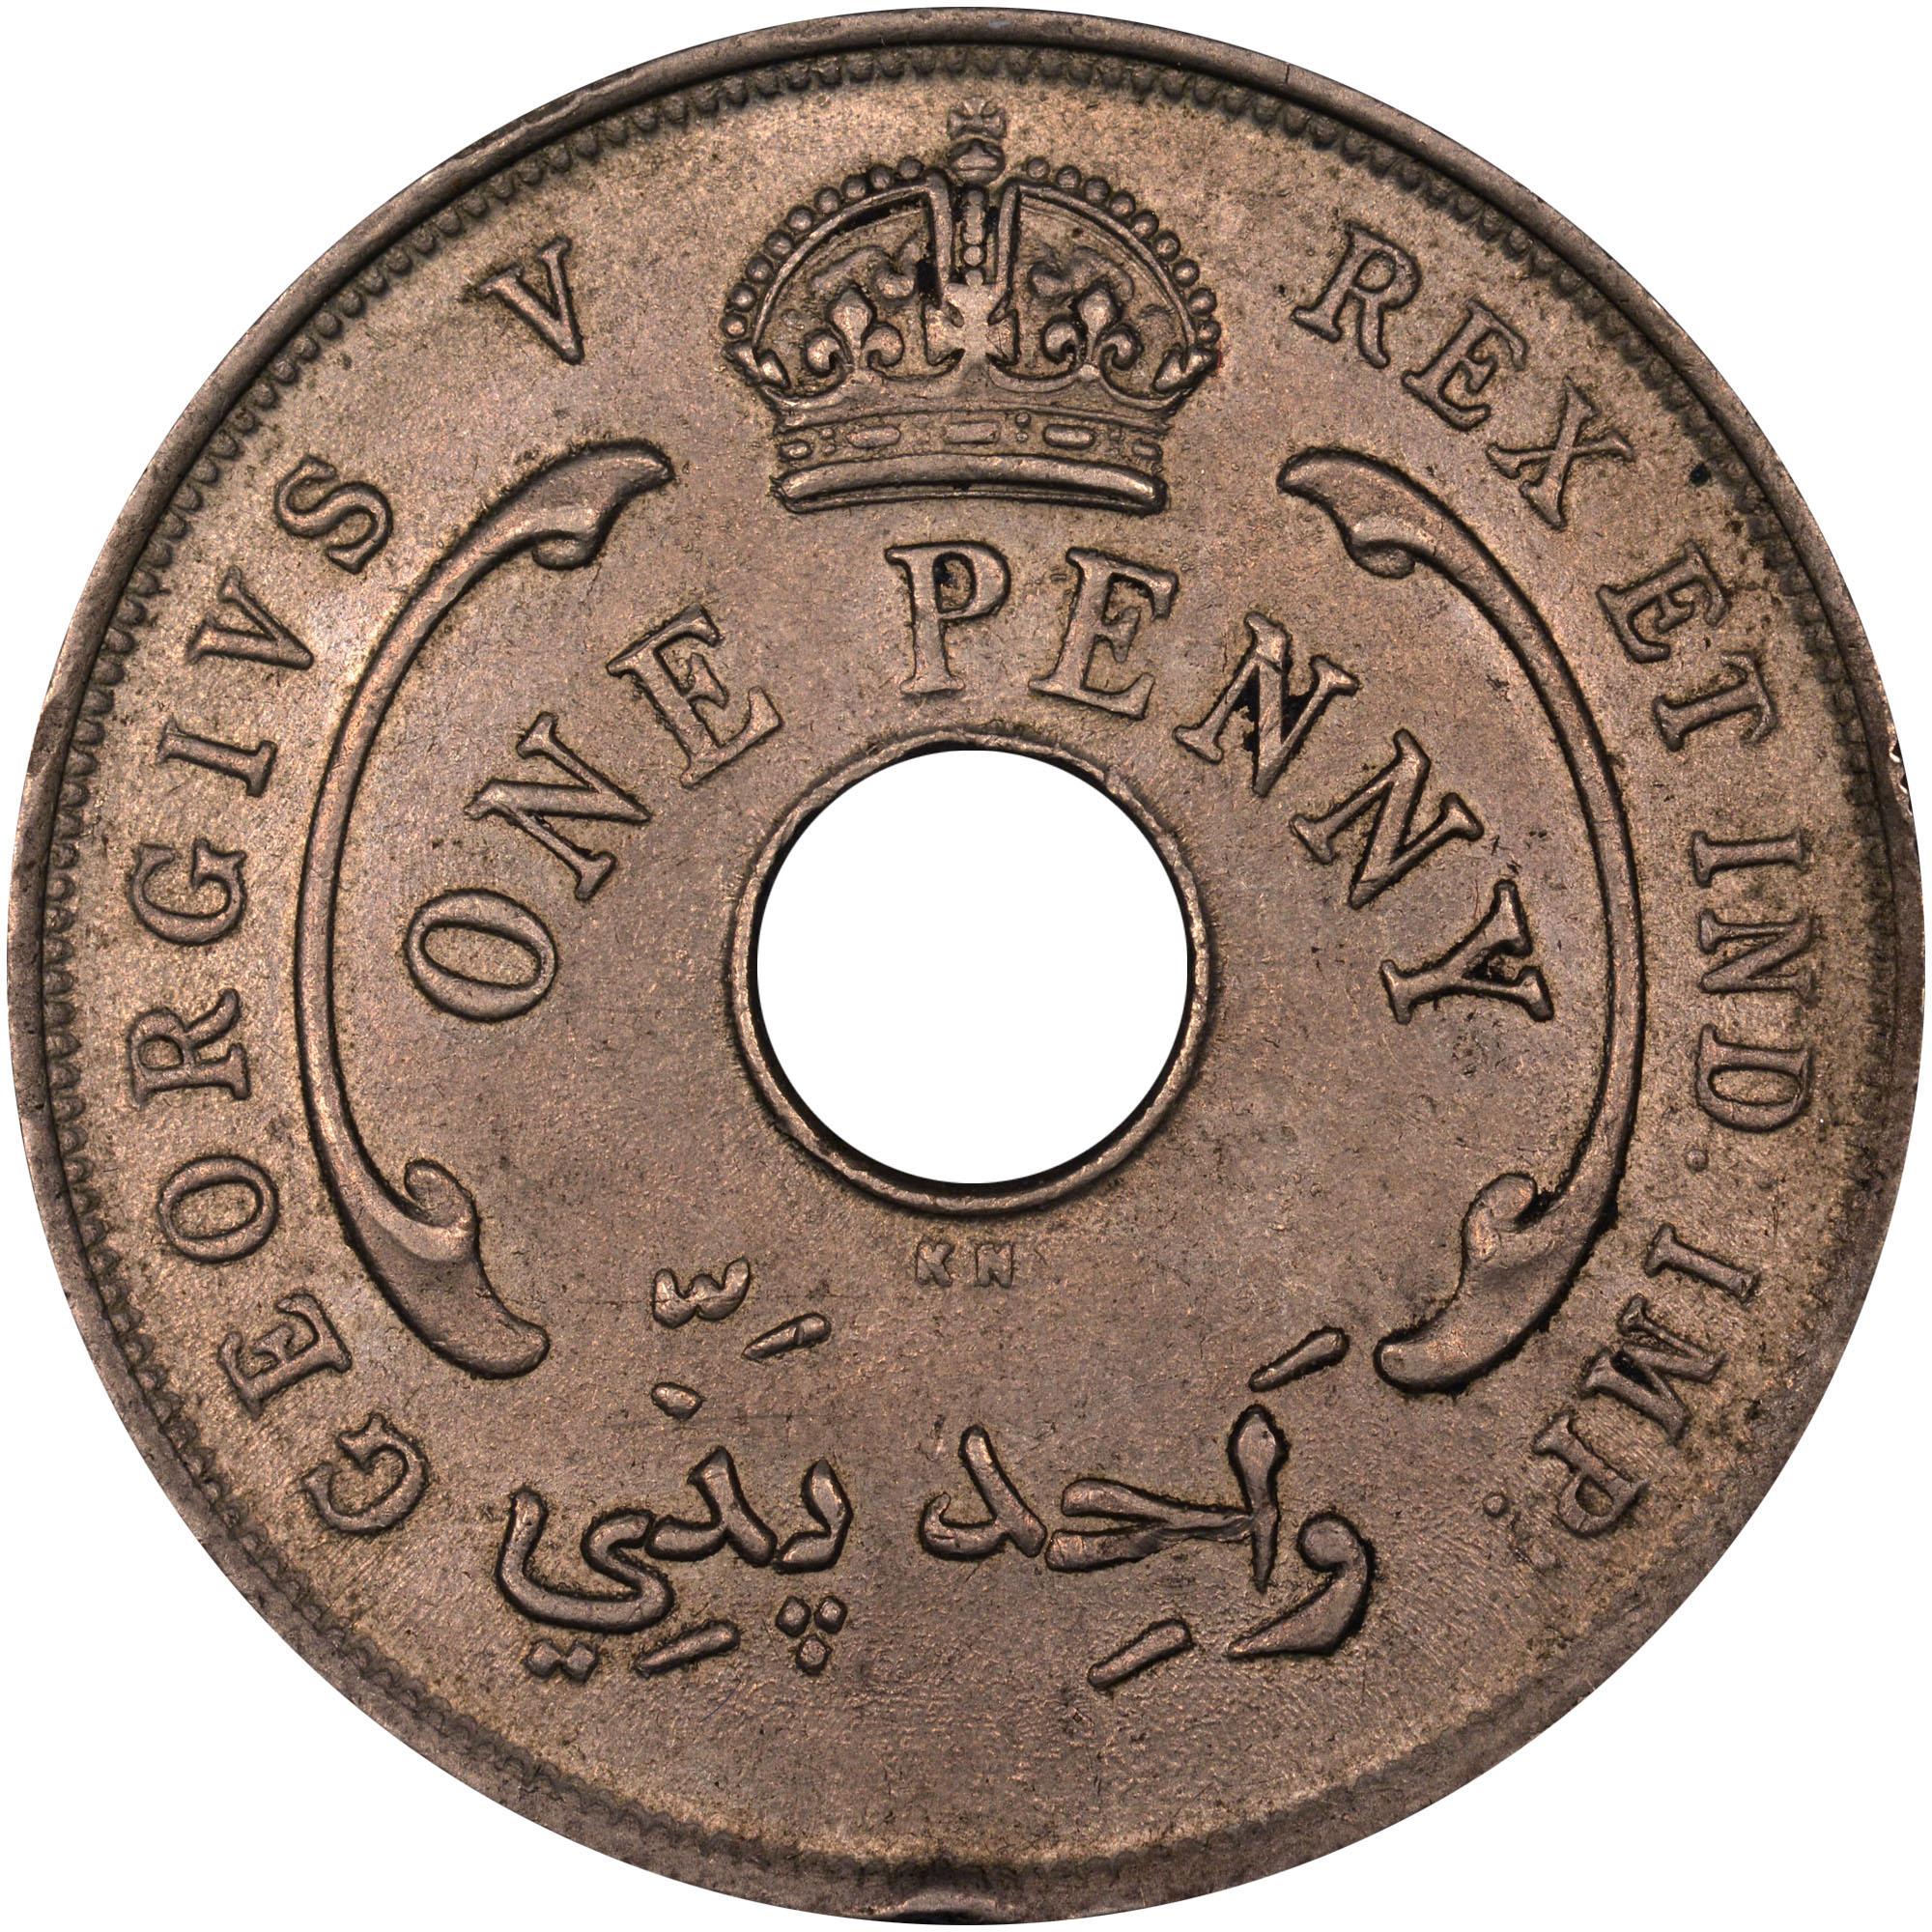 1912-1936 British West Africa Penny obverse